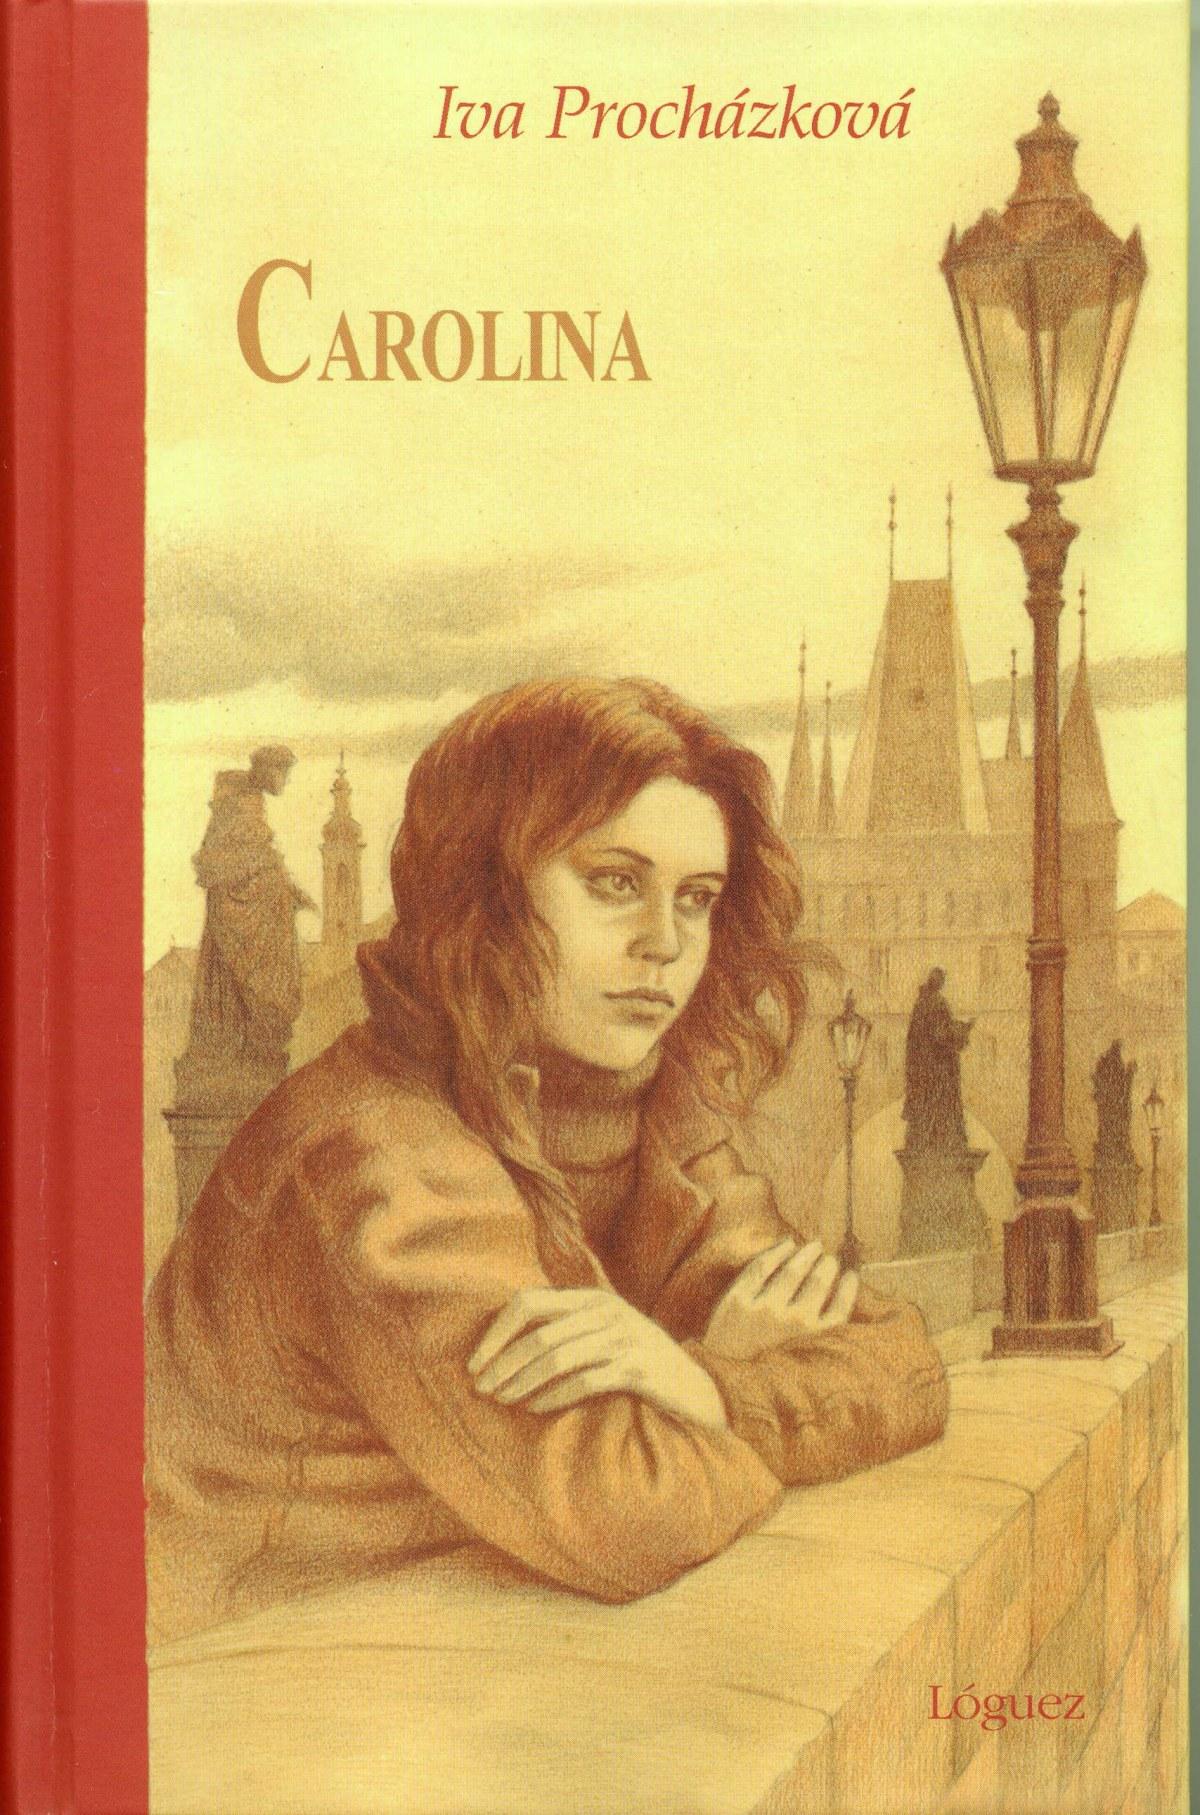 Carolina (Desde 13 Años) - Cartone - Prochazkova, Iva